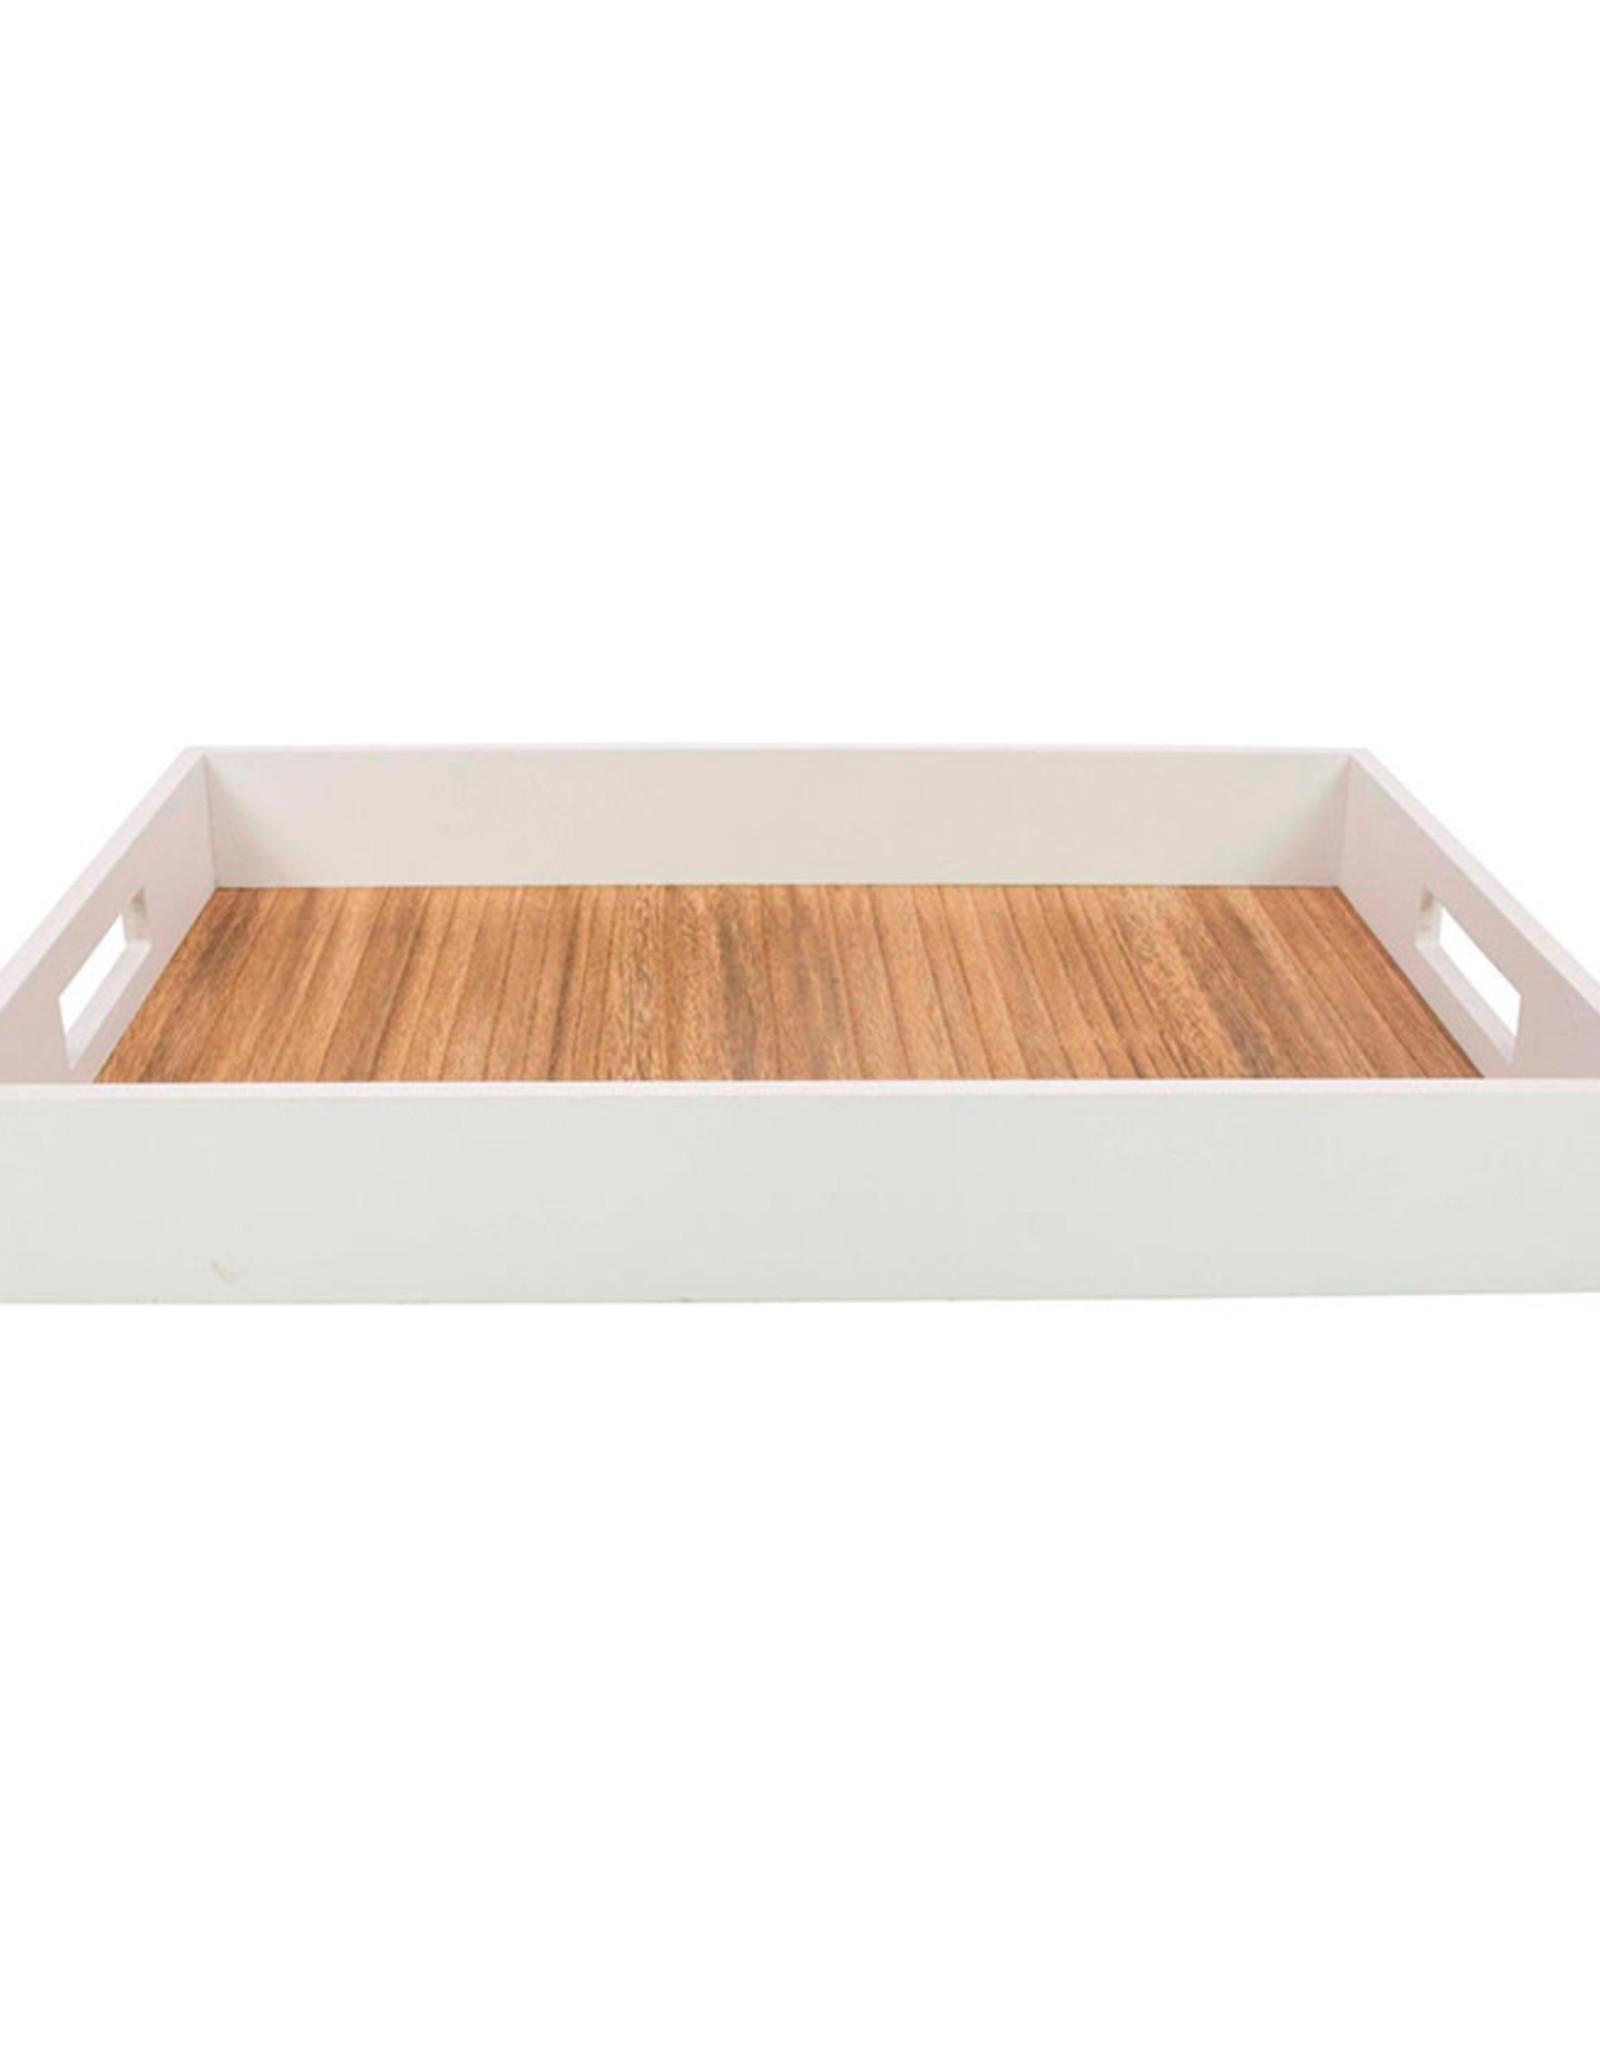 Dienblad Gusta 38x28cm-white/wood